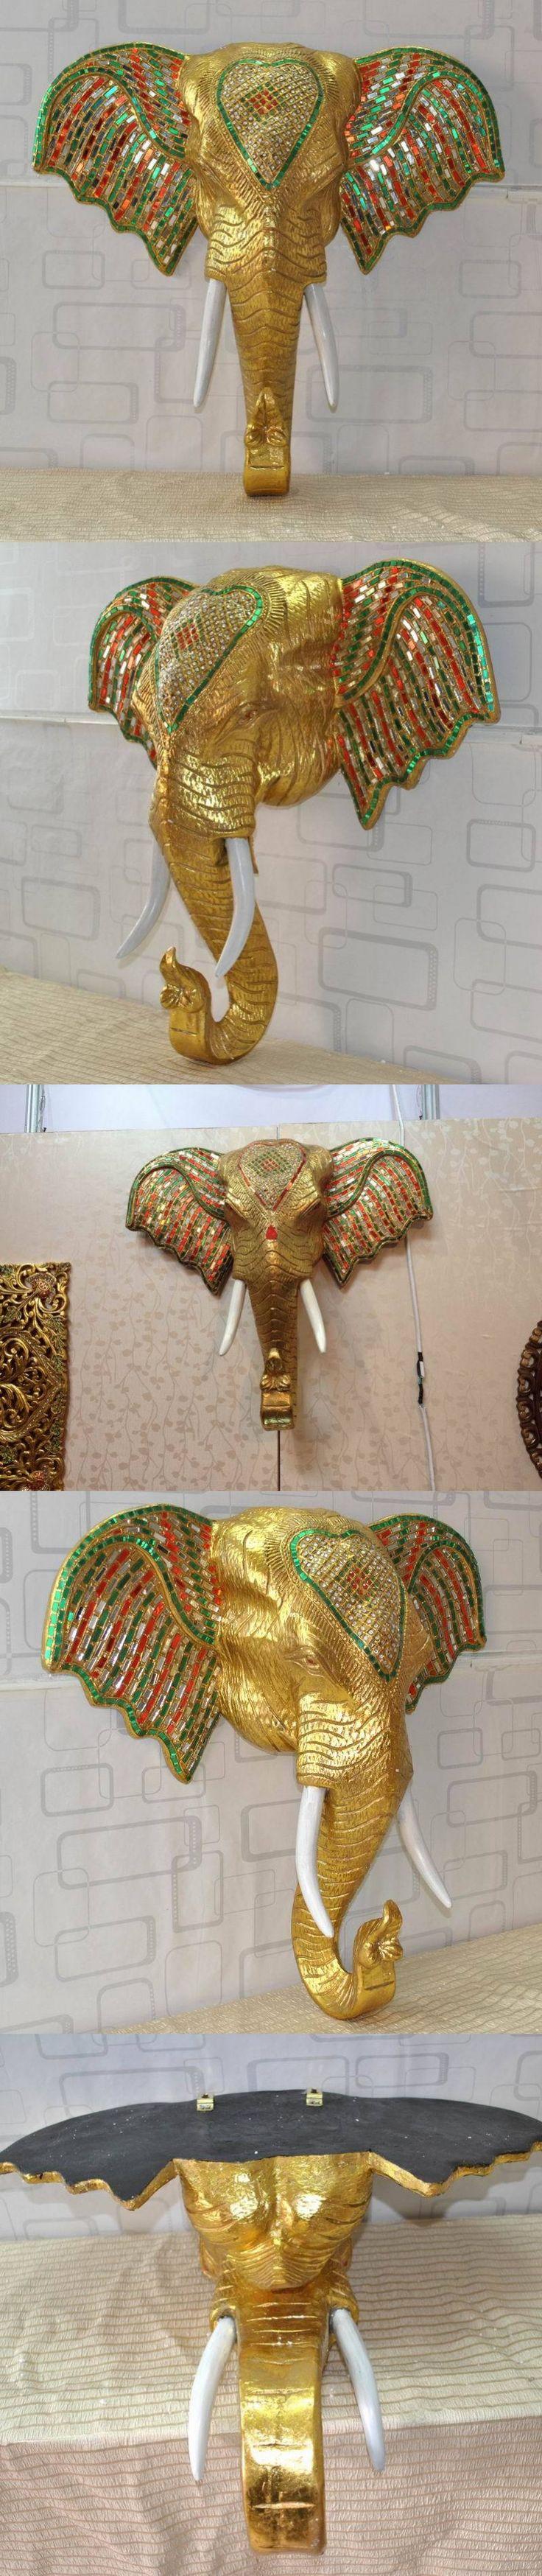 25 Best Ideas About Thai Elephant On Pinterest Colorful Elephant Thailand Elephants And